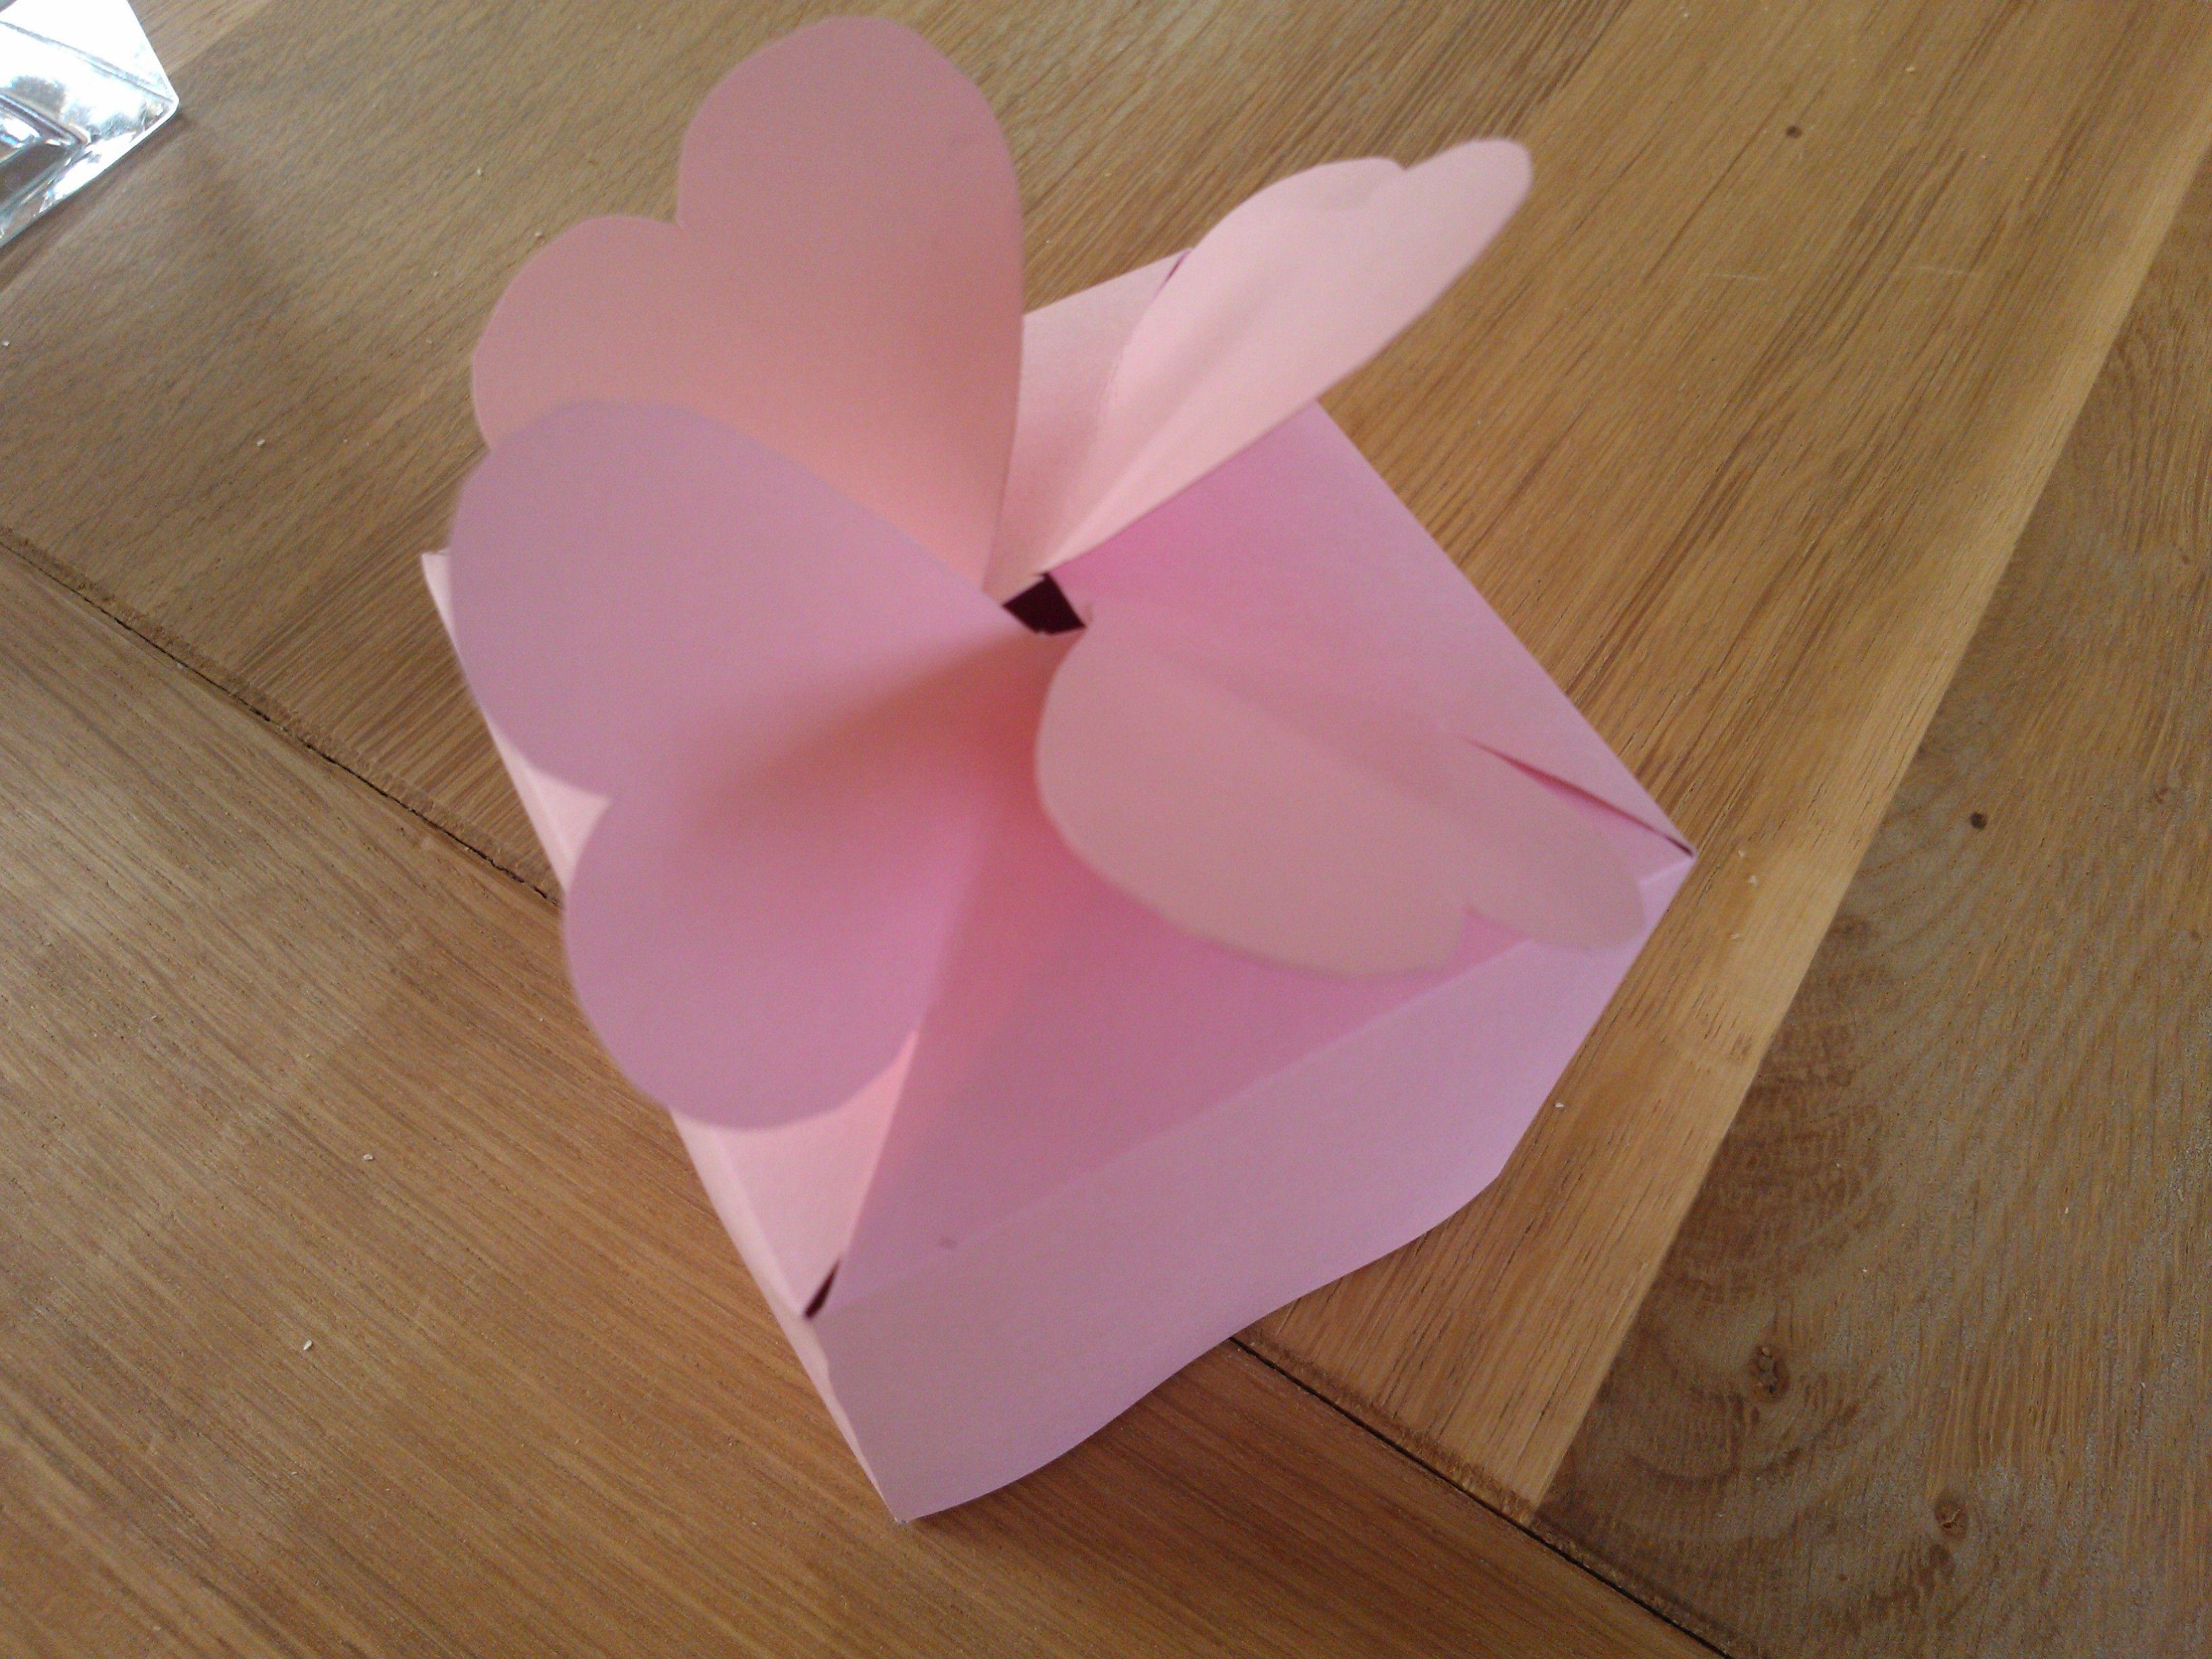 Homemade gift box | Kids craft ideas | Pinterest | Homemade gift ...